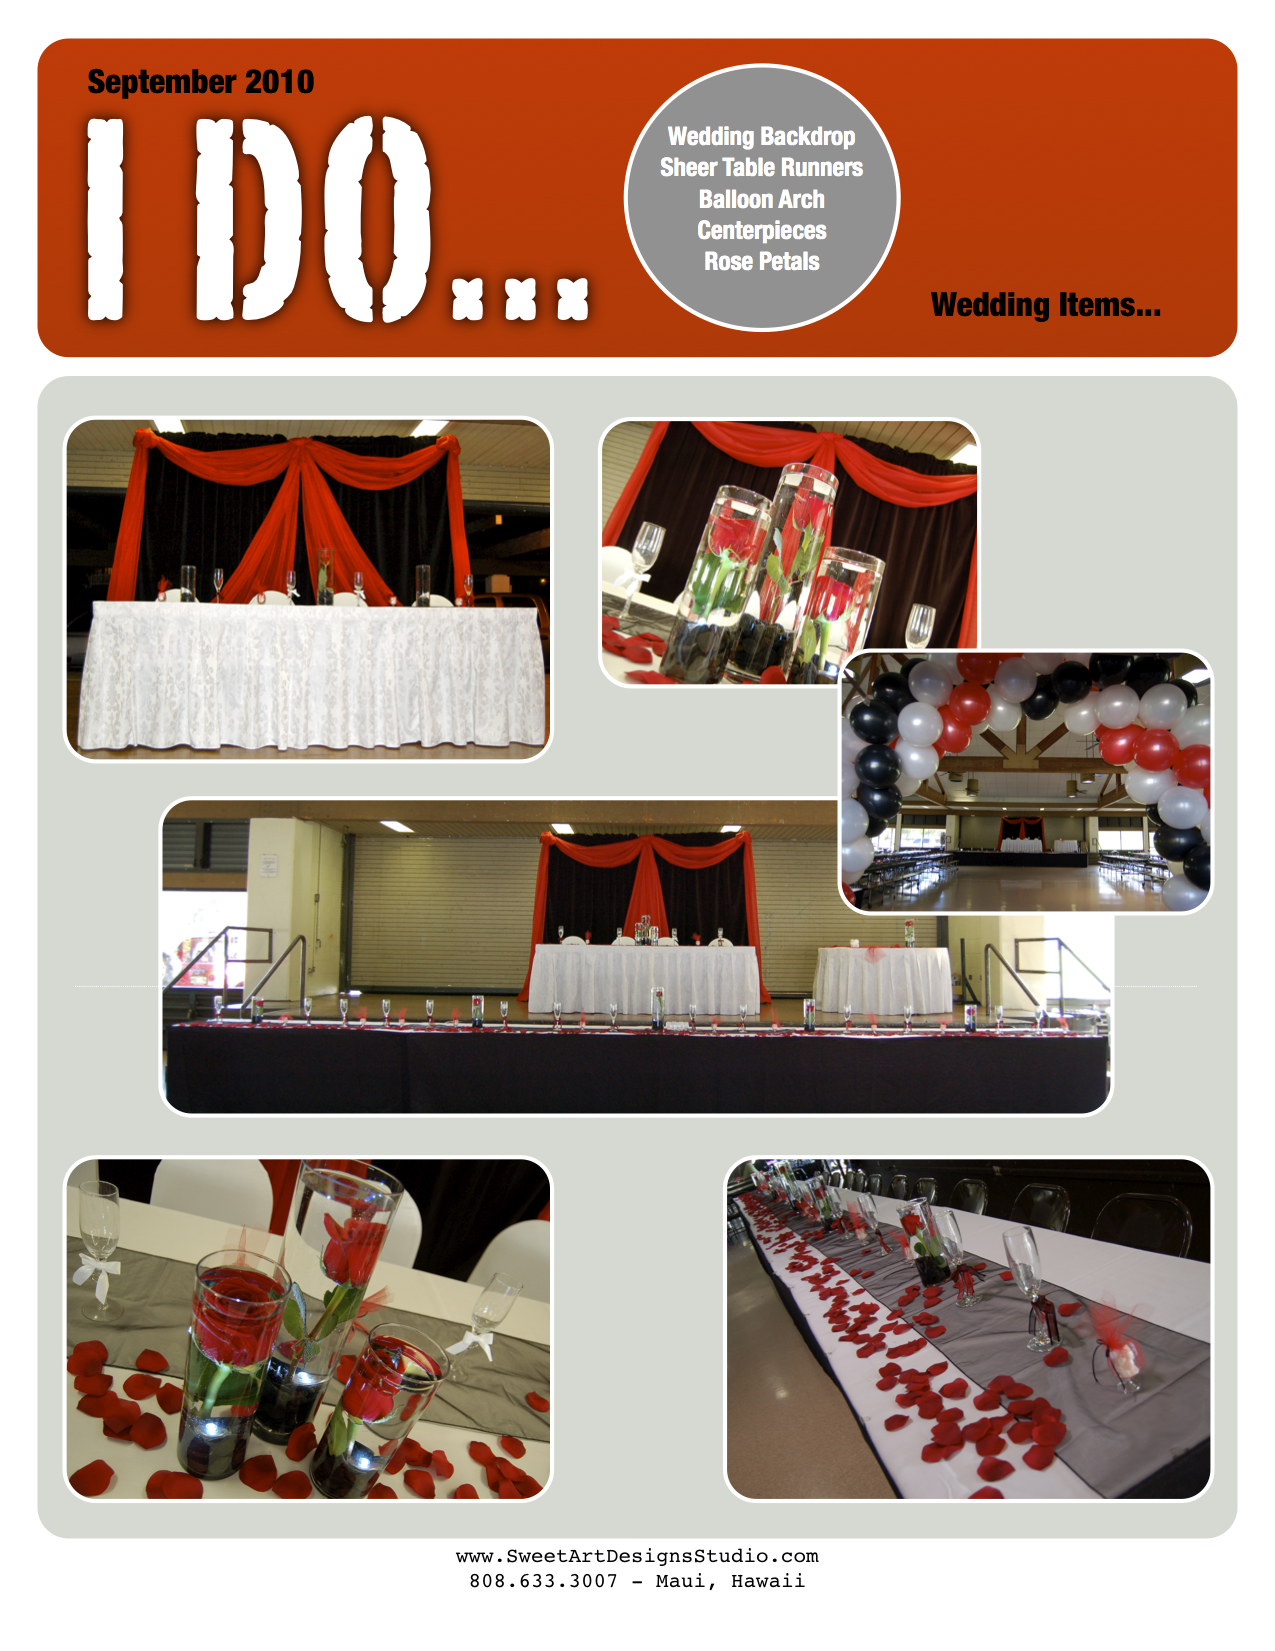 Black on black wedding decor  Wedding u Black Red White Backdrop balloon arch and more